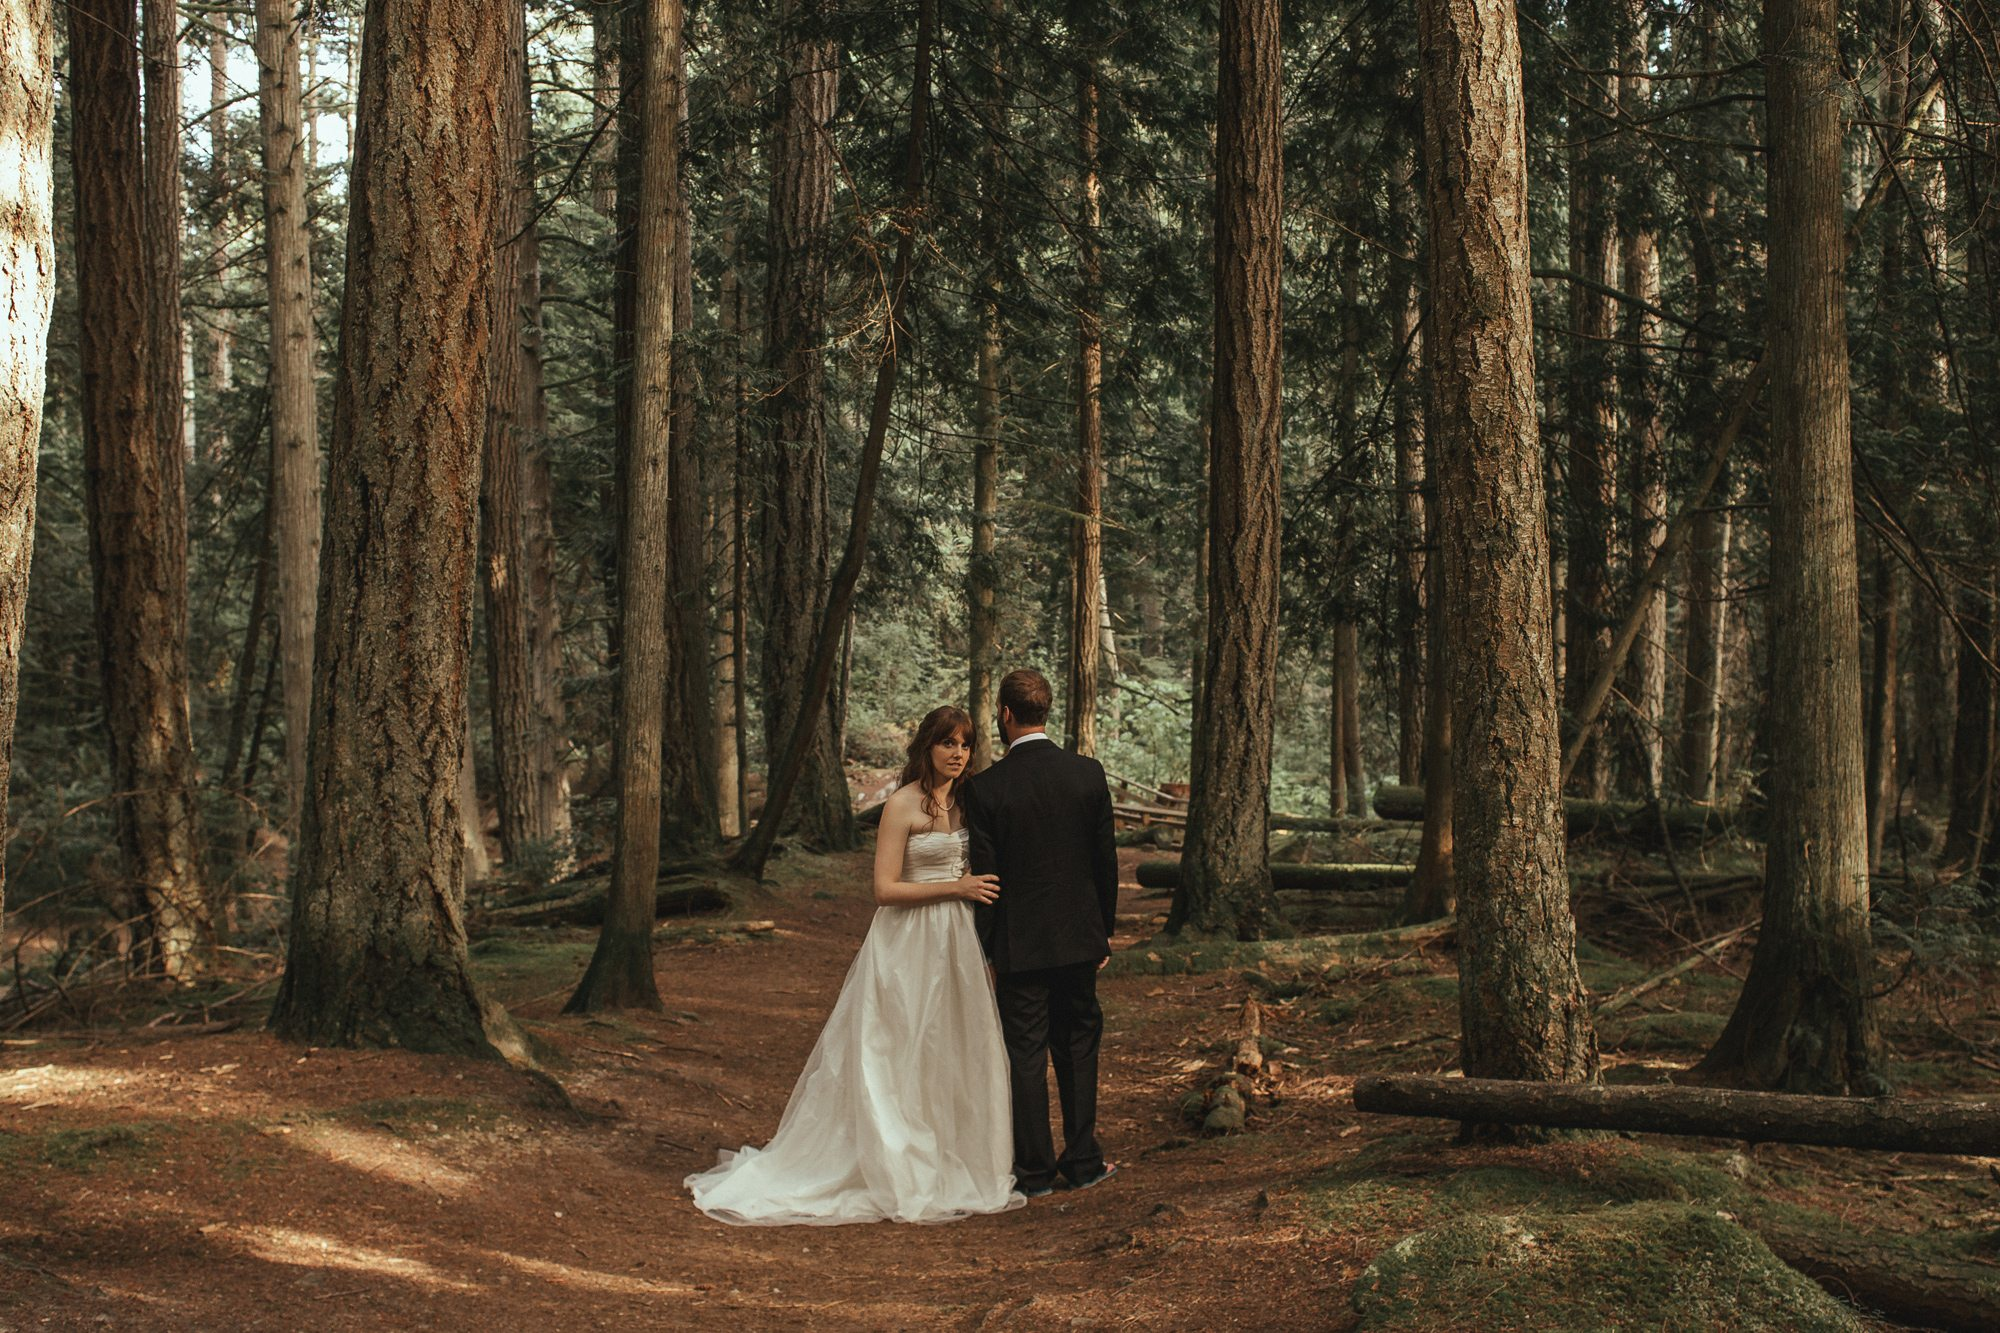 gibsons-wedding-photography-robert-devon37